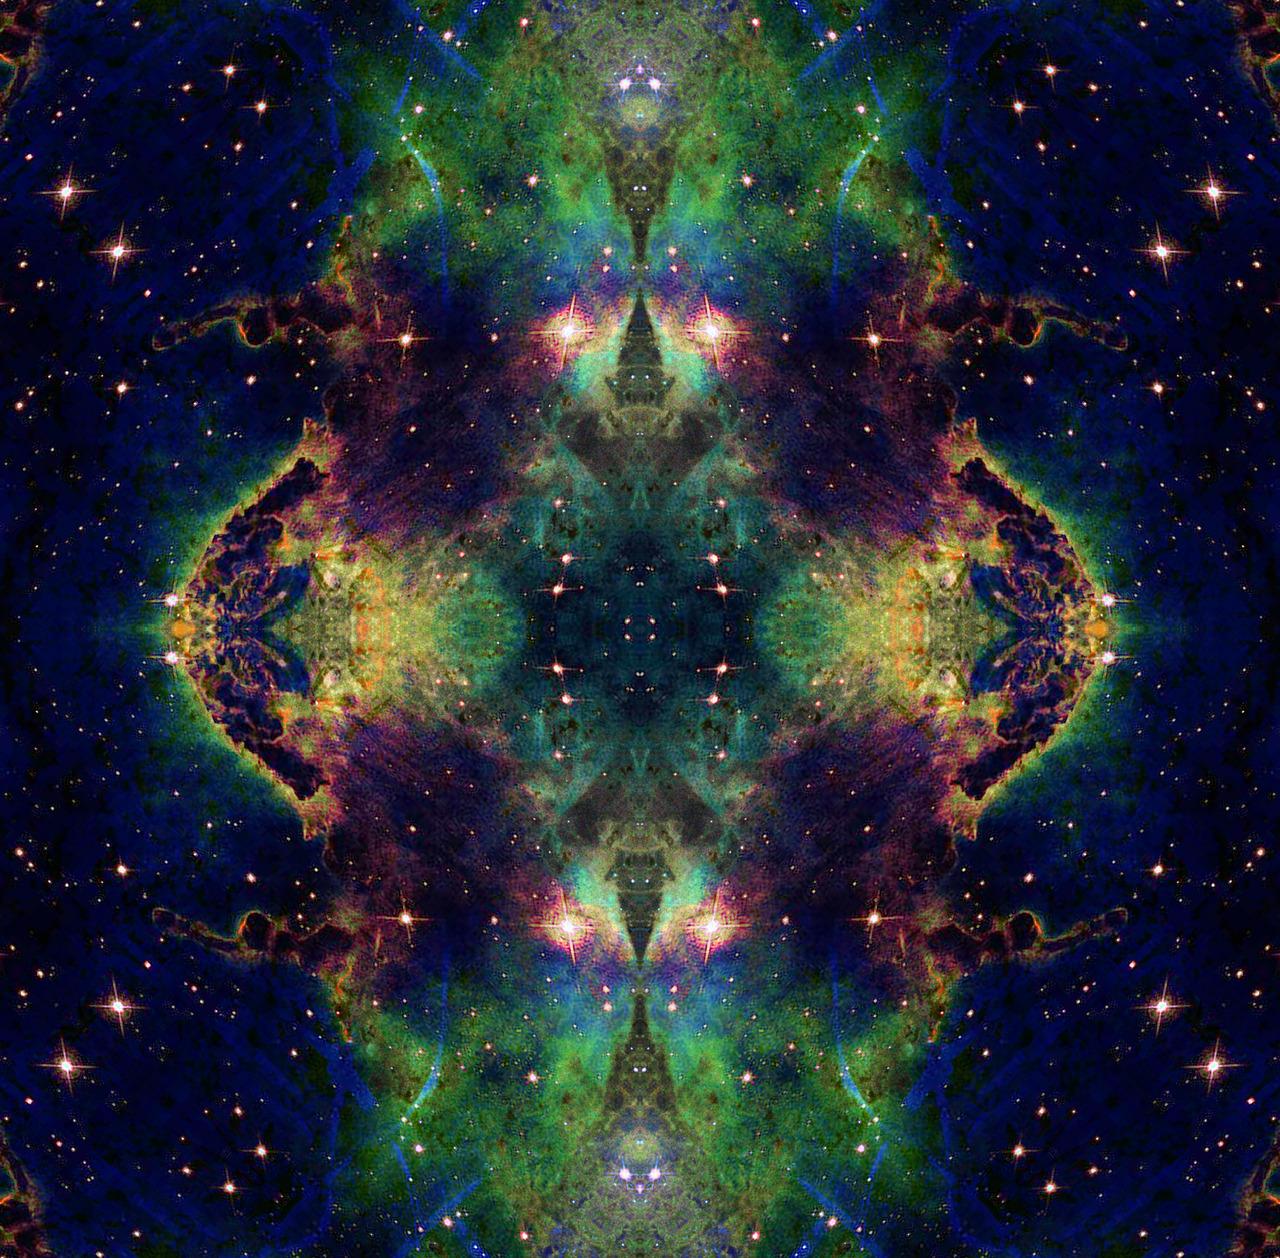 trippy galaxy wallpaper - photo #14